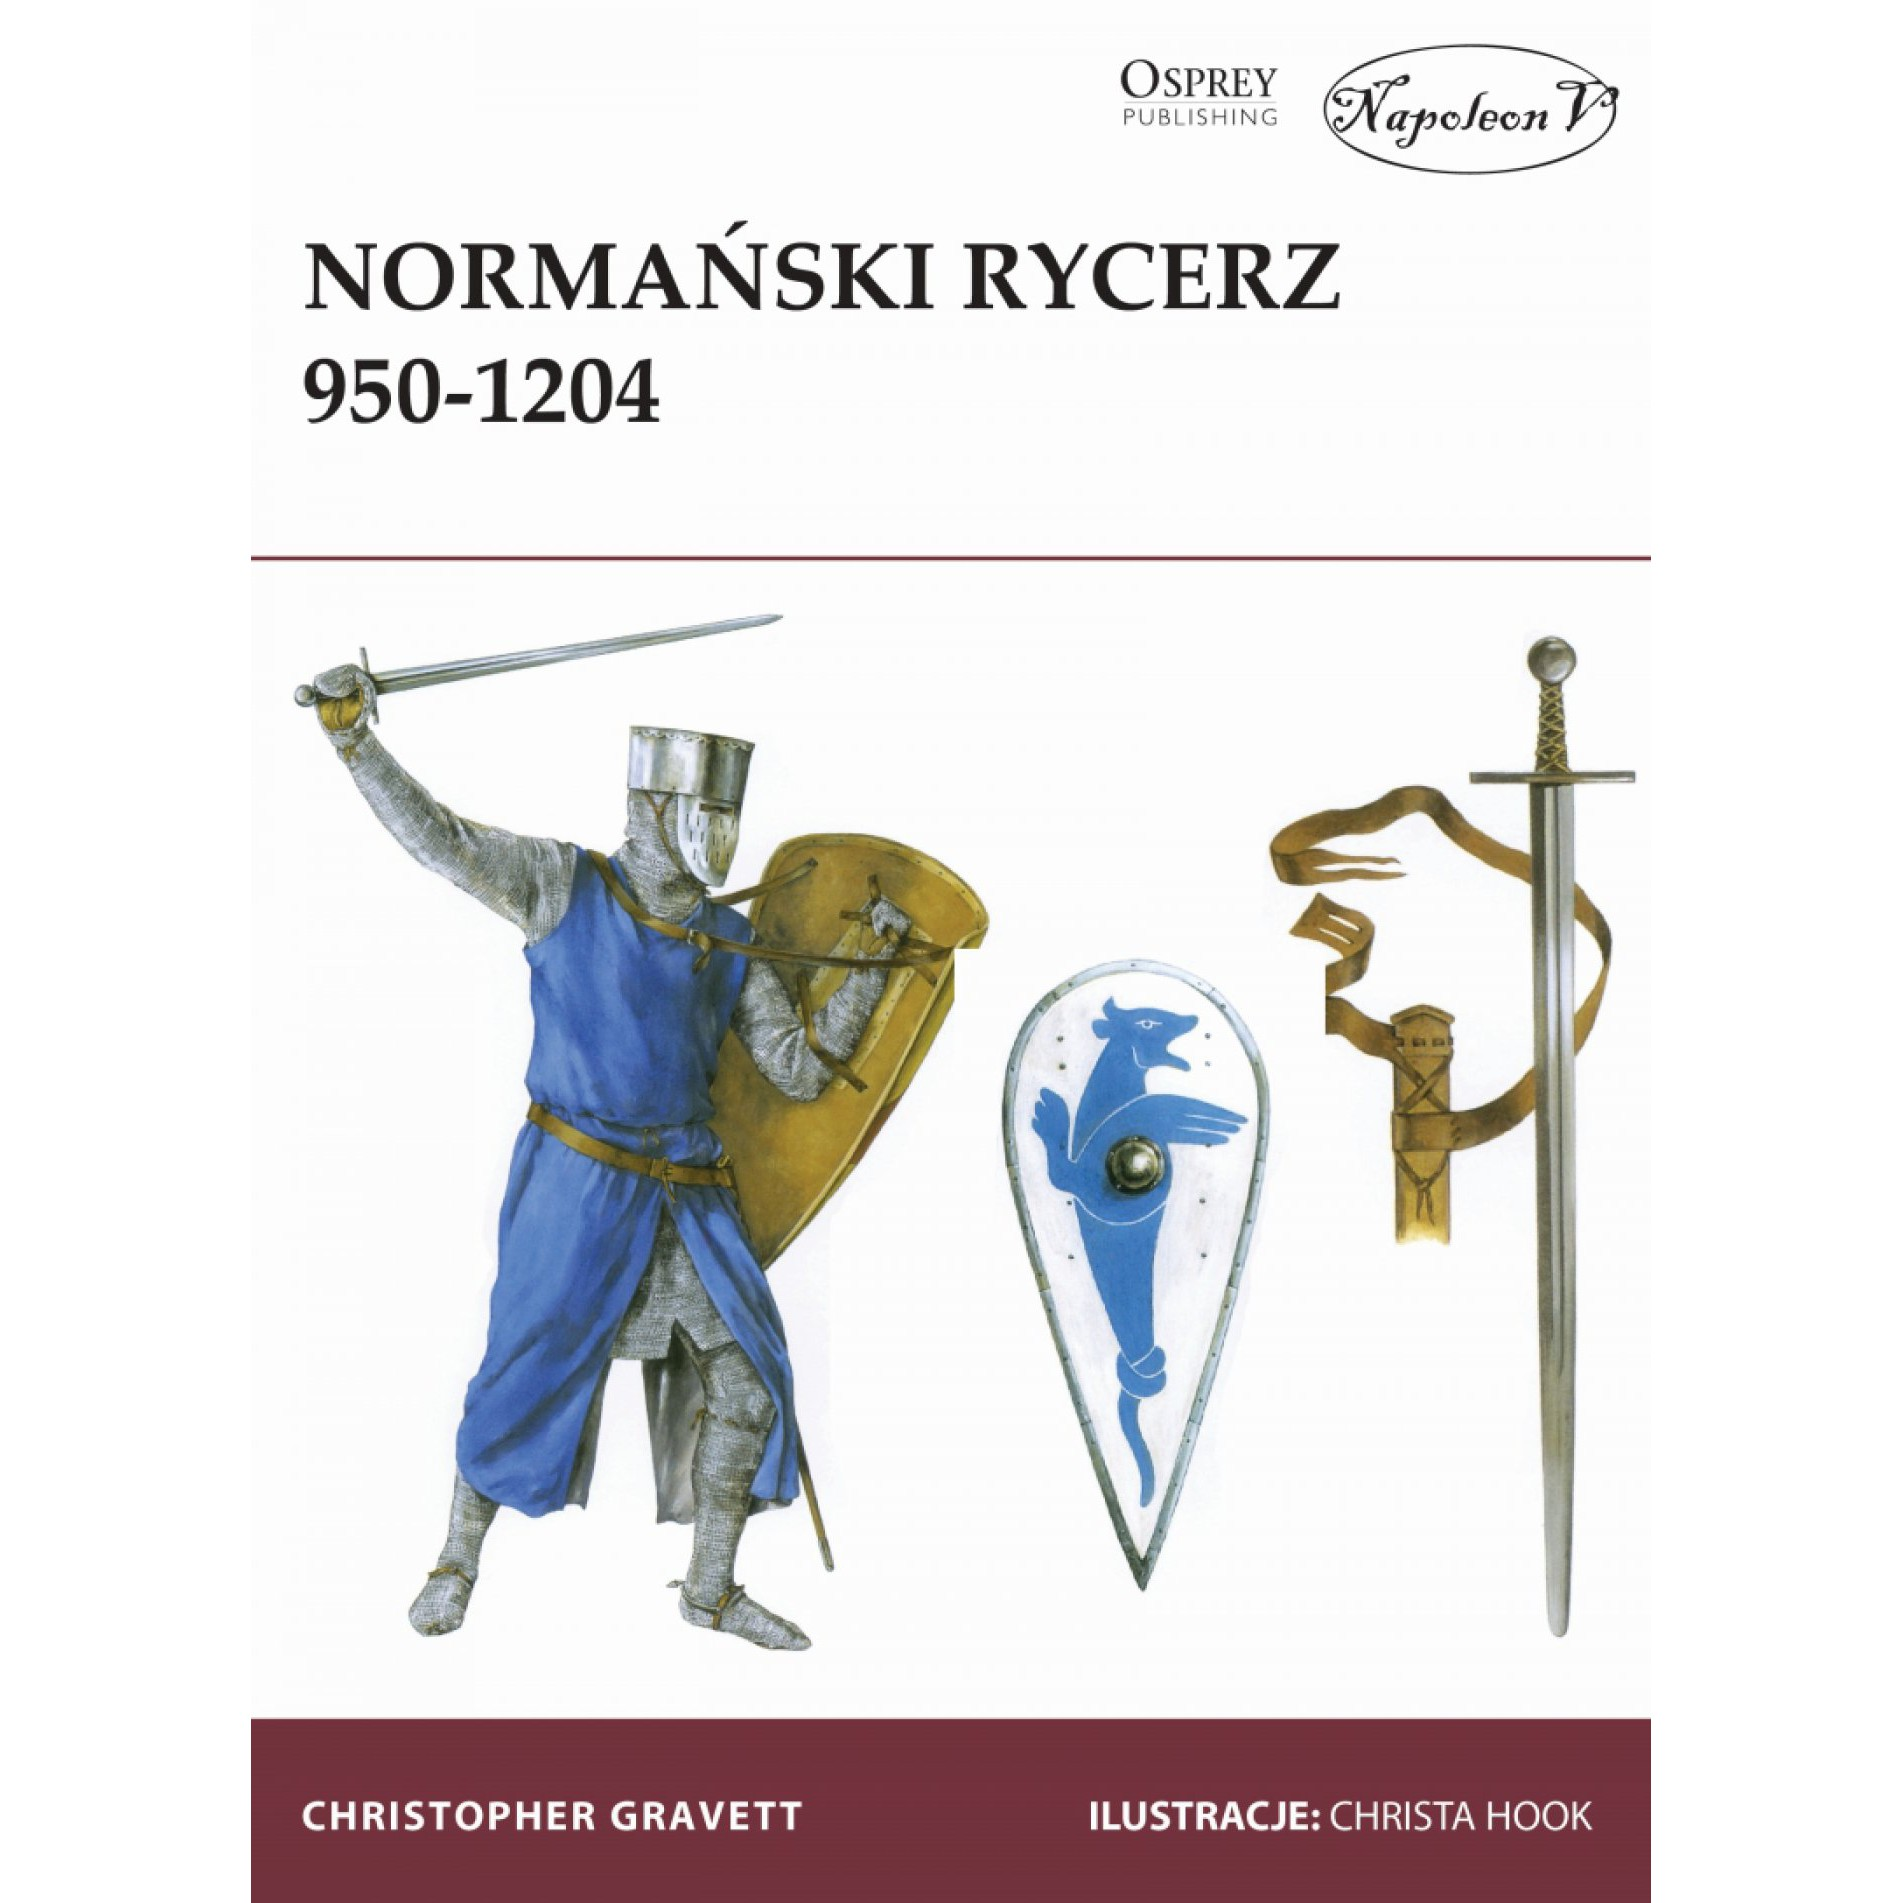 Normański rycerz 950-1204